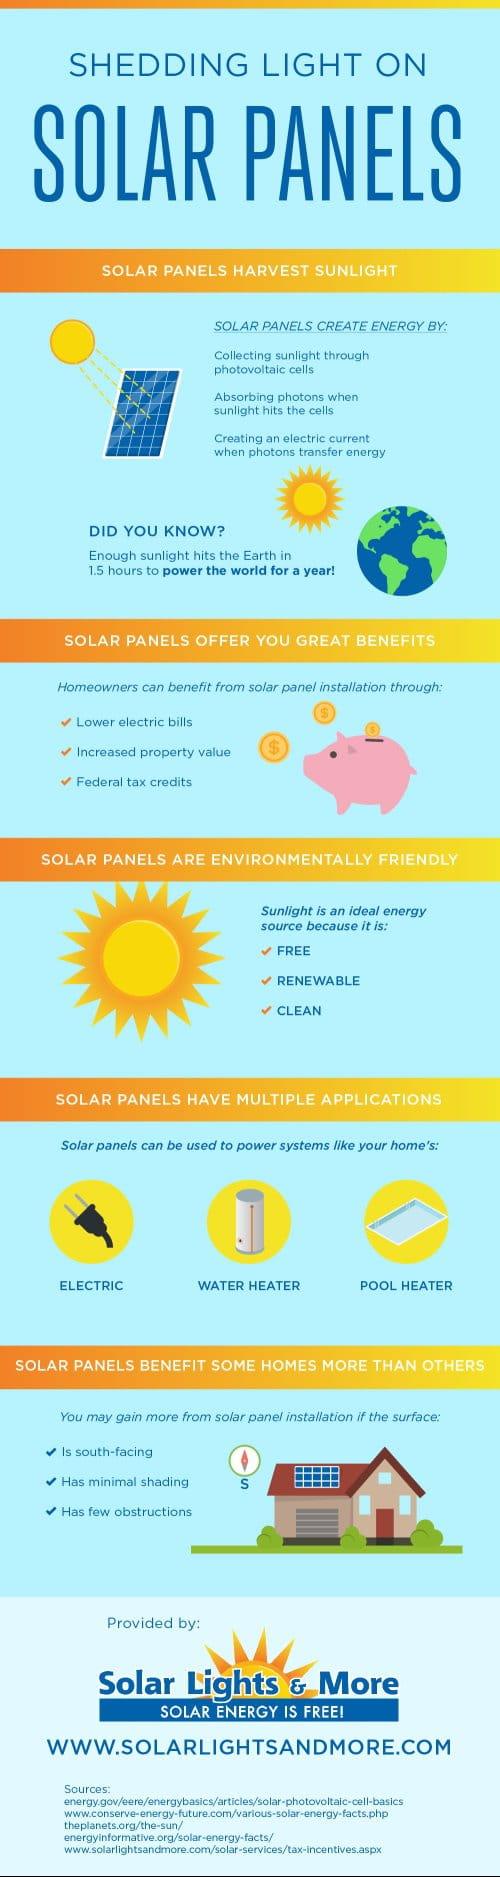 Shedding Light on Solar Panels